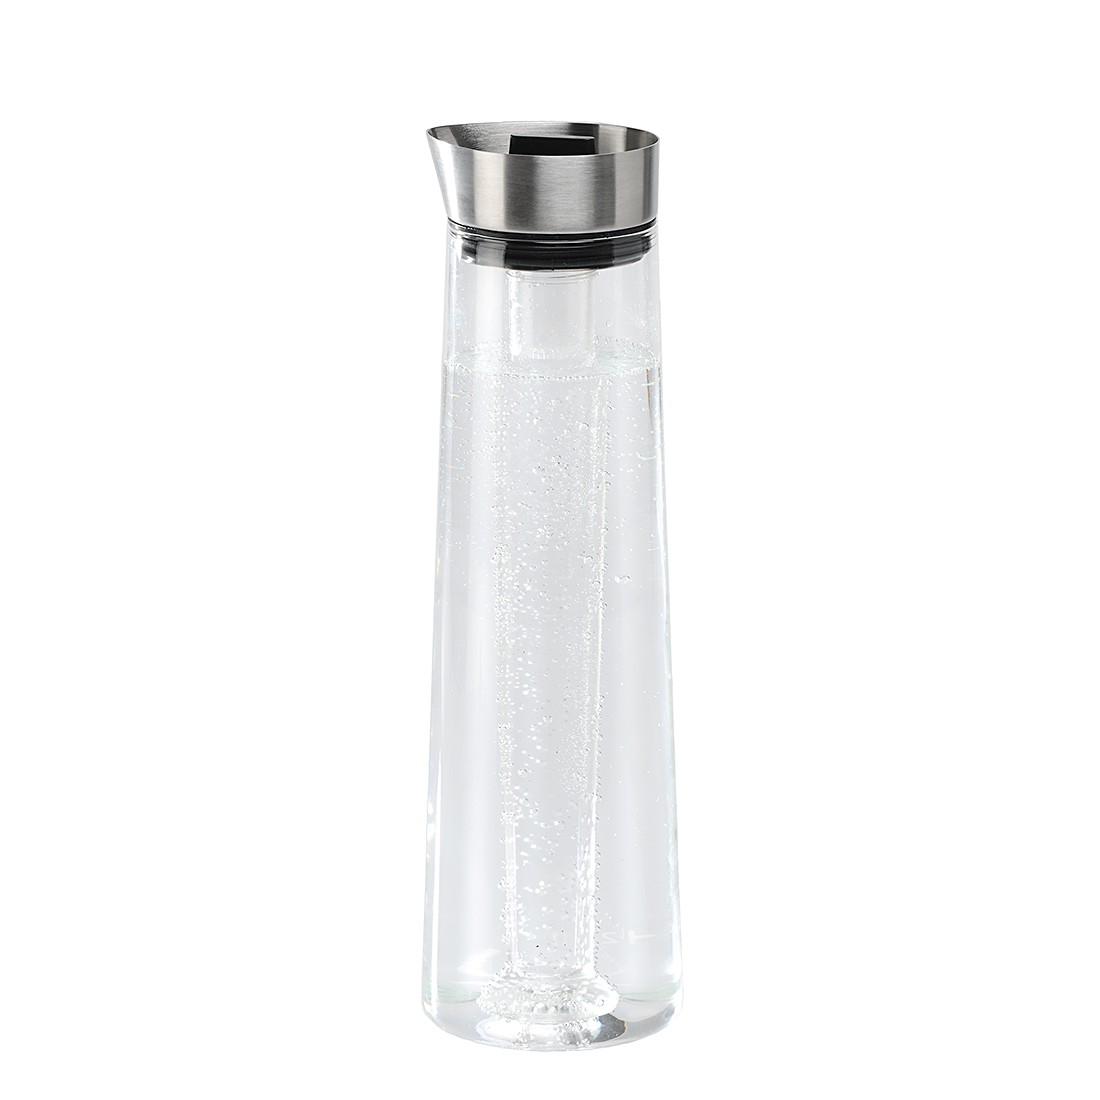 Wasserkaraffe Acqua Cool – 1,2l, Blomus bestellen